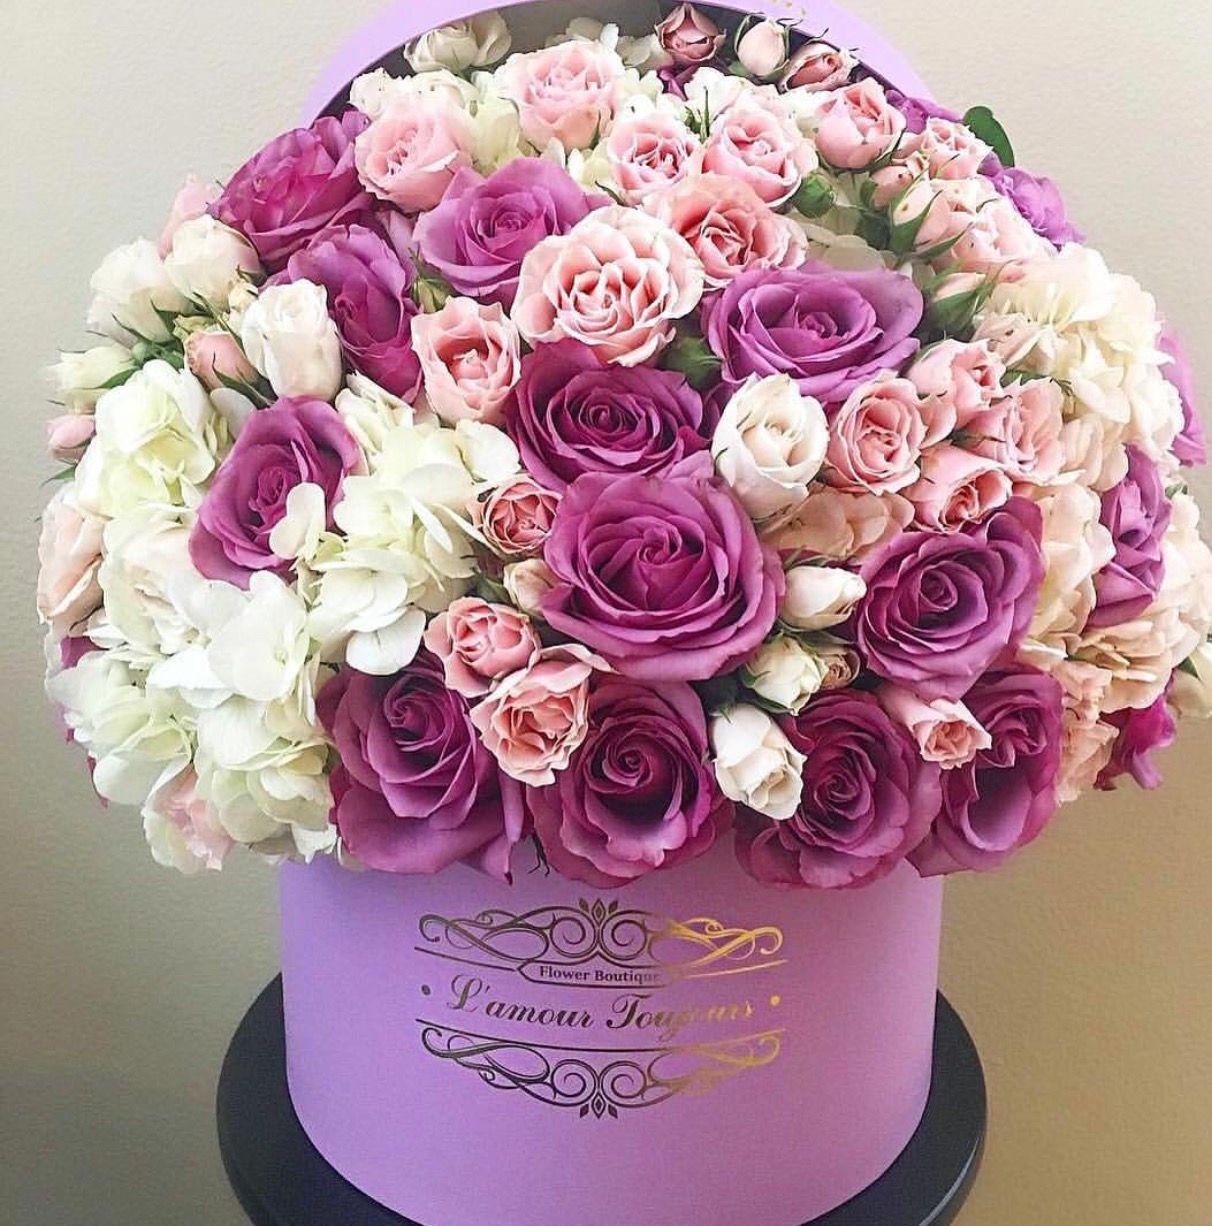 Pin by Liza Dinata on FLOWER BOX 1 Luxury flowers